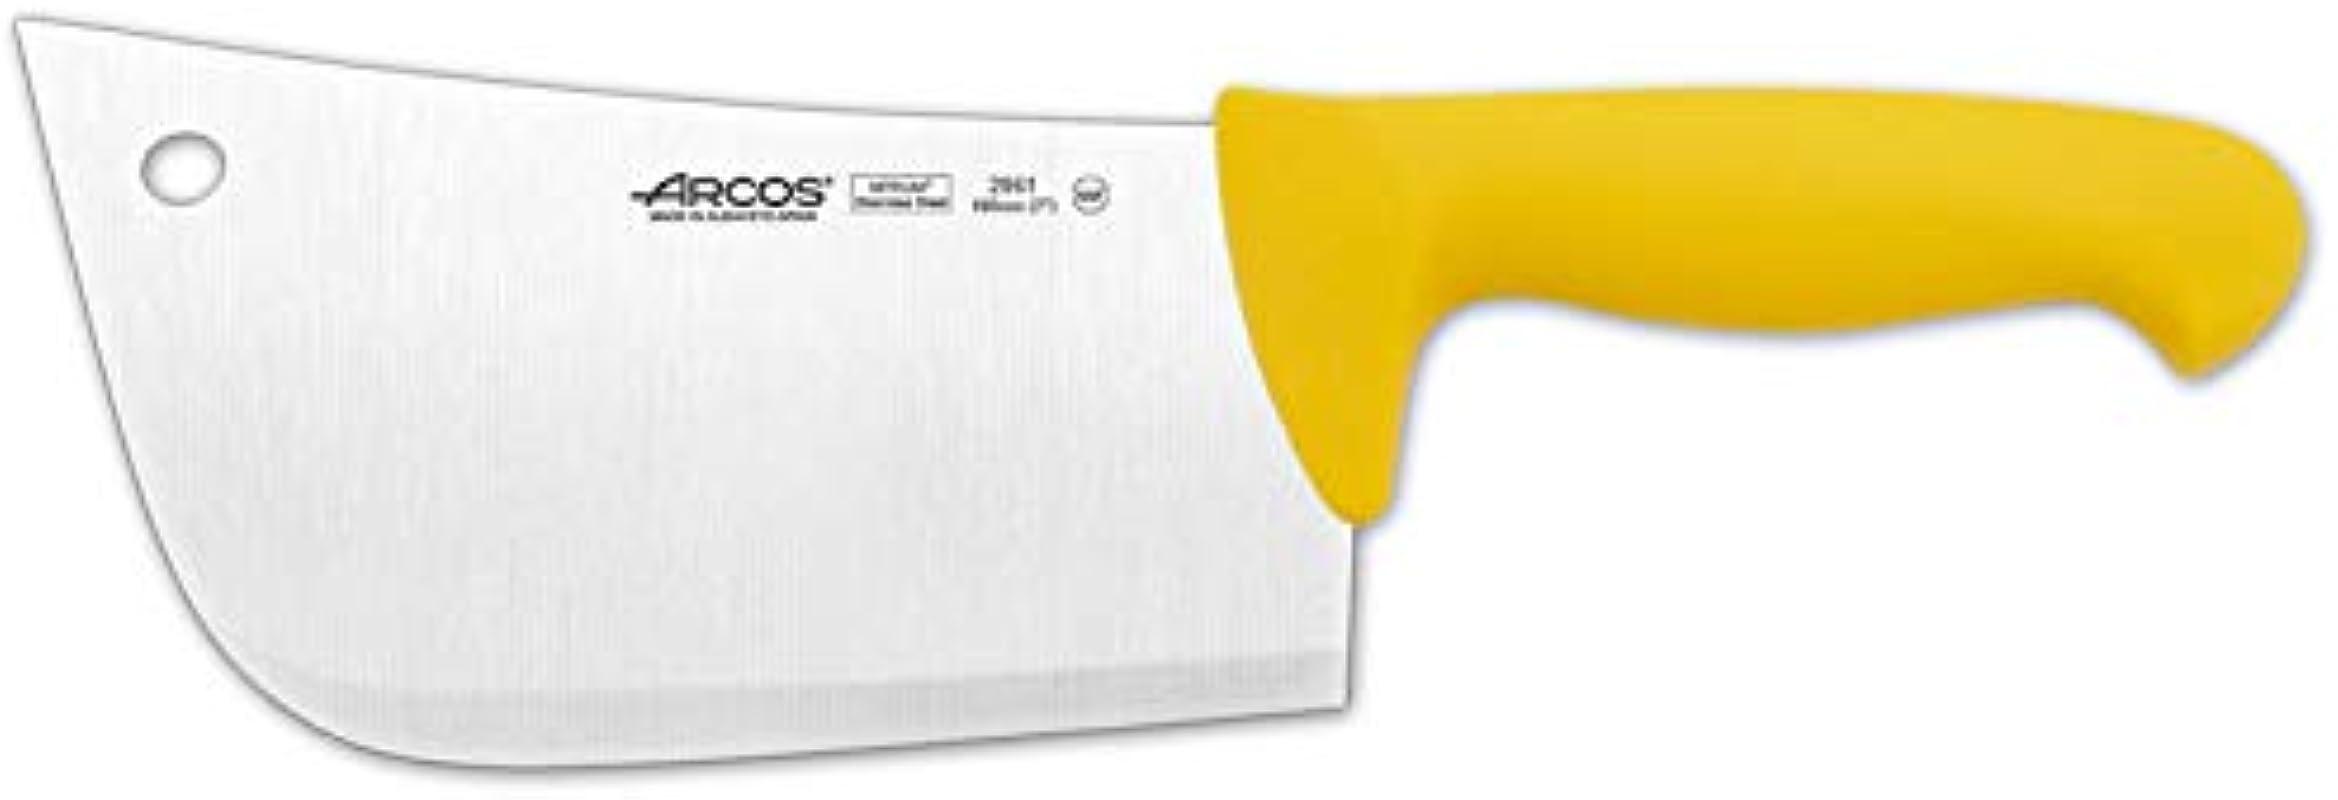 Arcos 8 Inch 190 Mm 530 Gm 2900 Range Cleaver Yellow